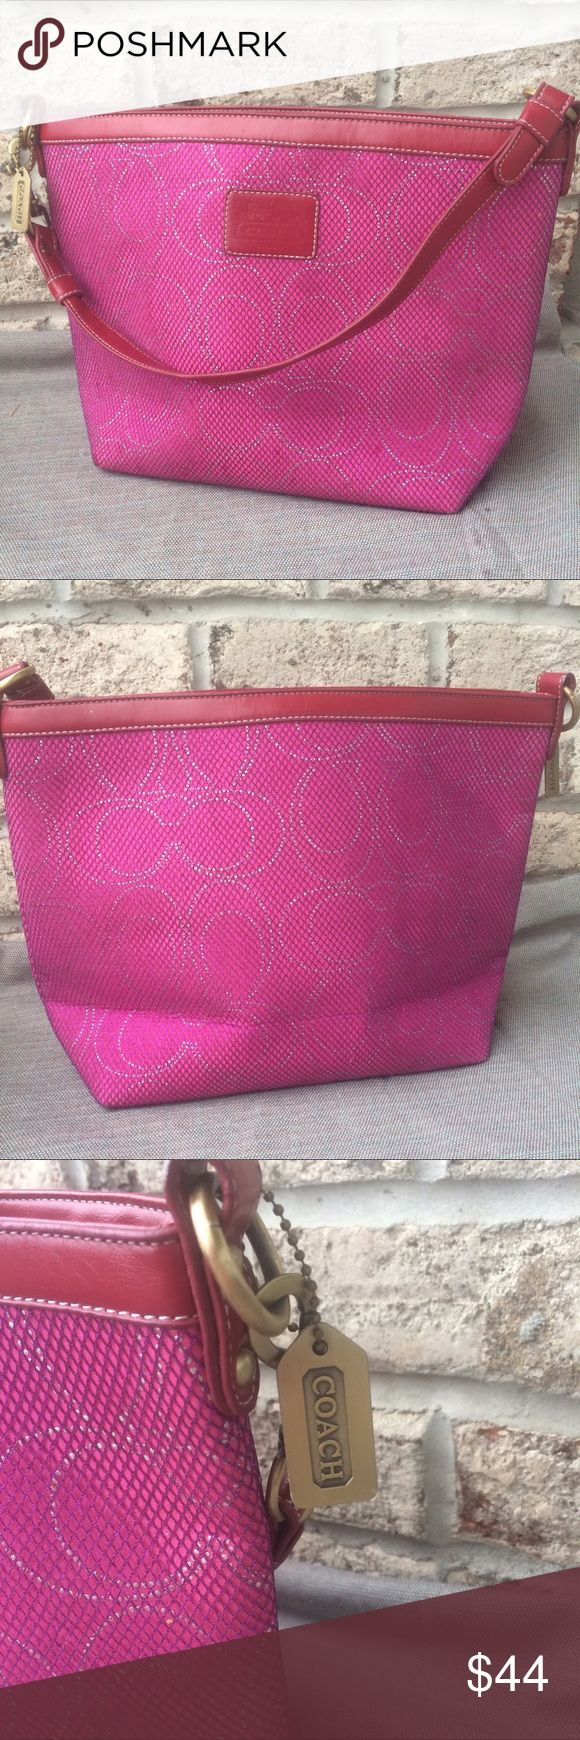 Pink Coach Handbag Bright pink shoulderbag with fine glitter detail Coach Bags Shoulder Bags